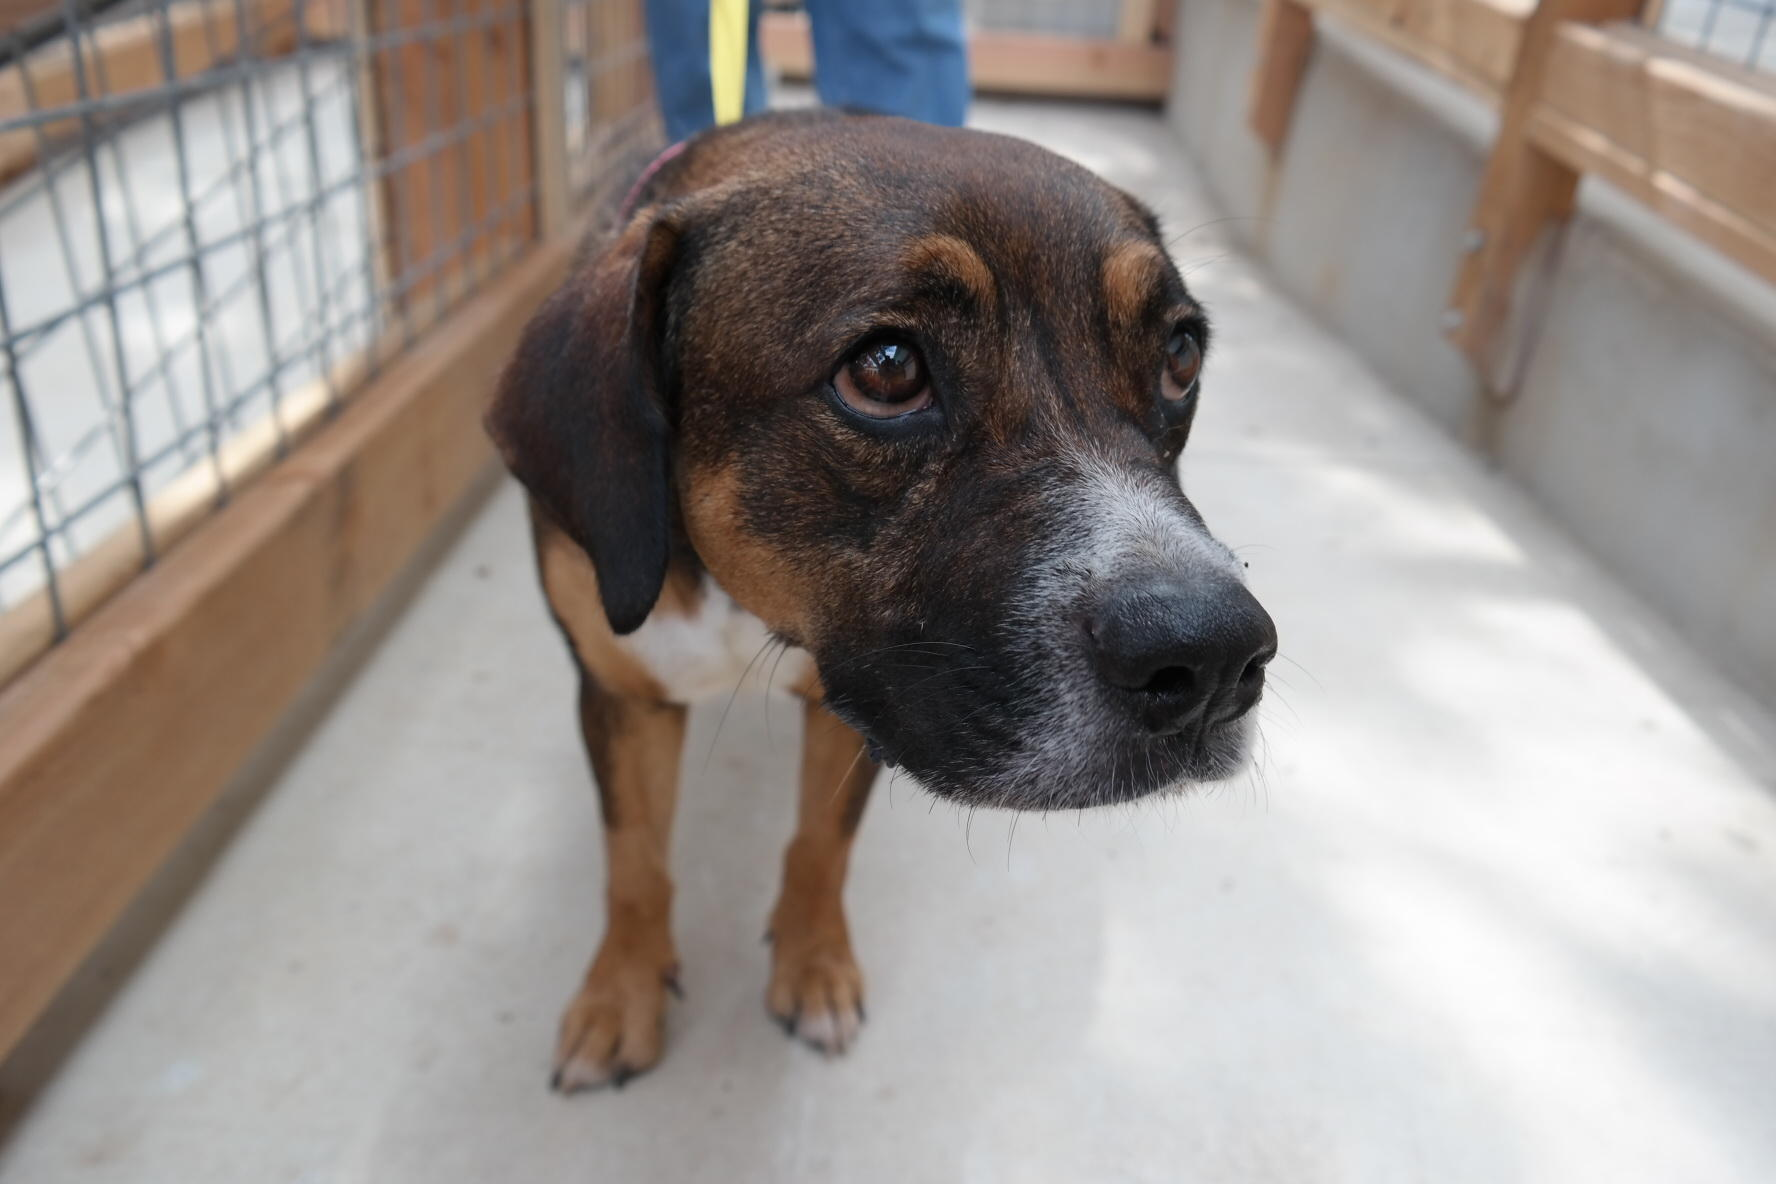 Newest Pet Adoption Center In San Antonio Sets Ambitious